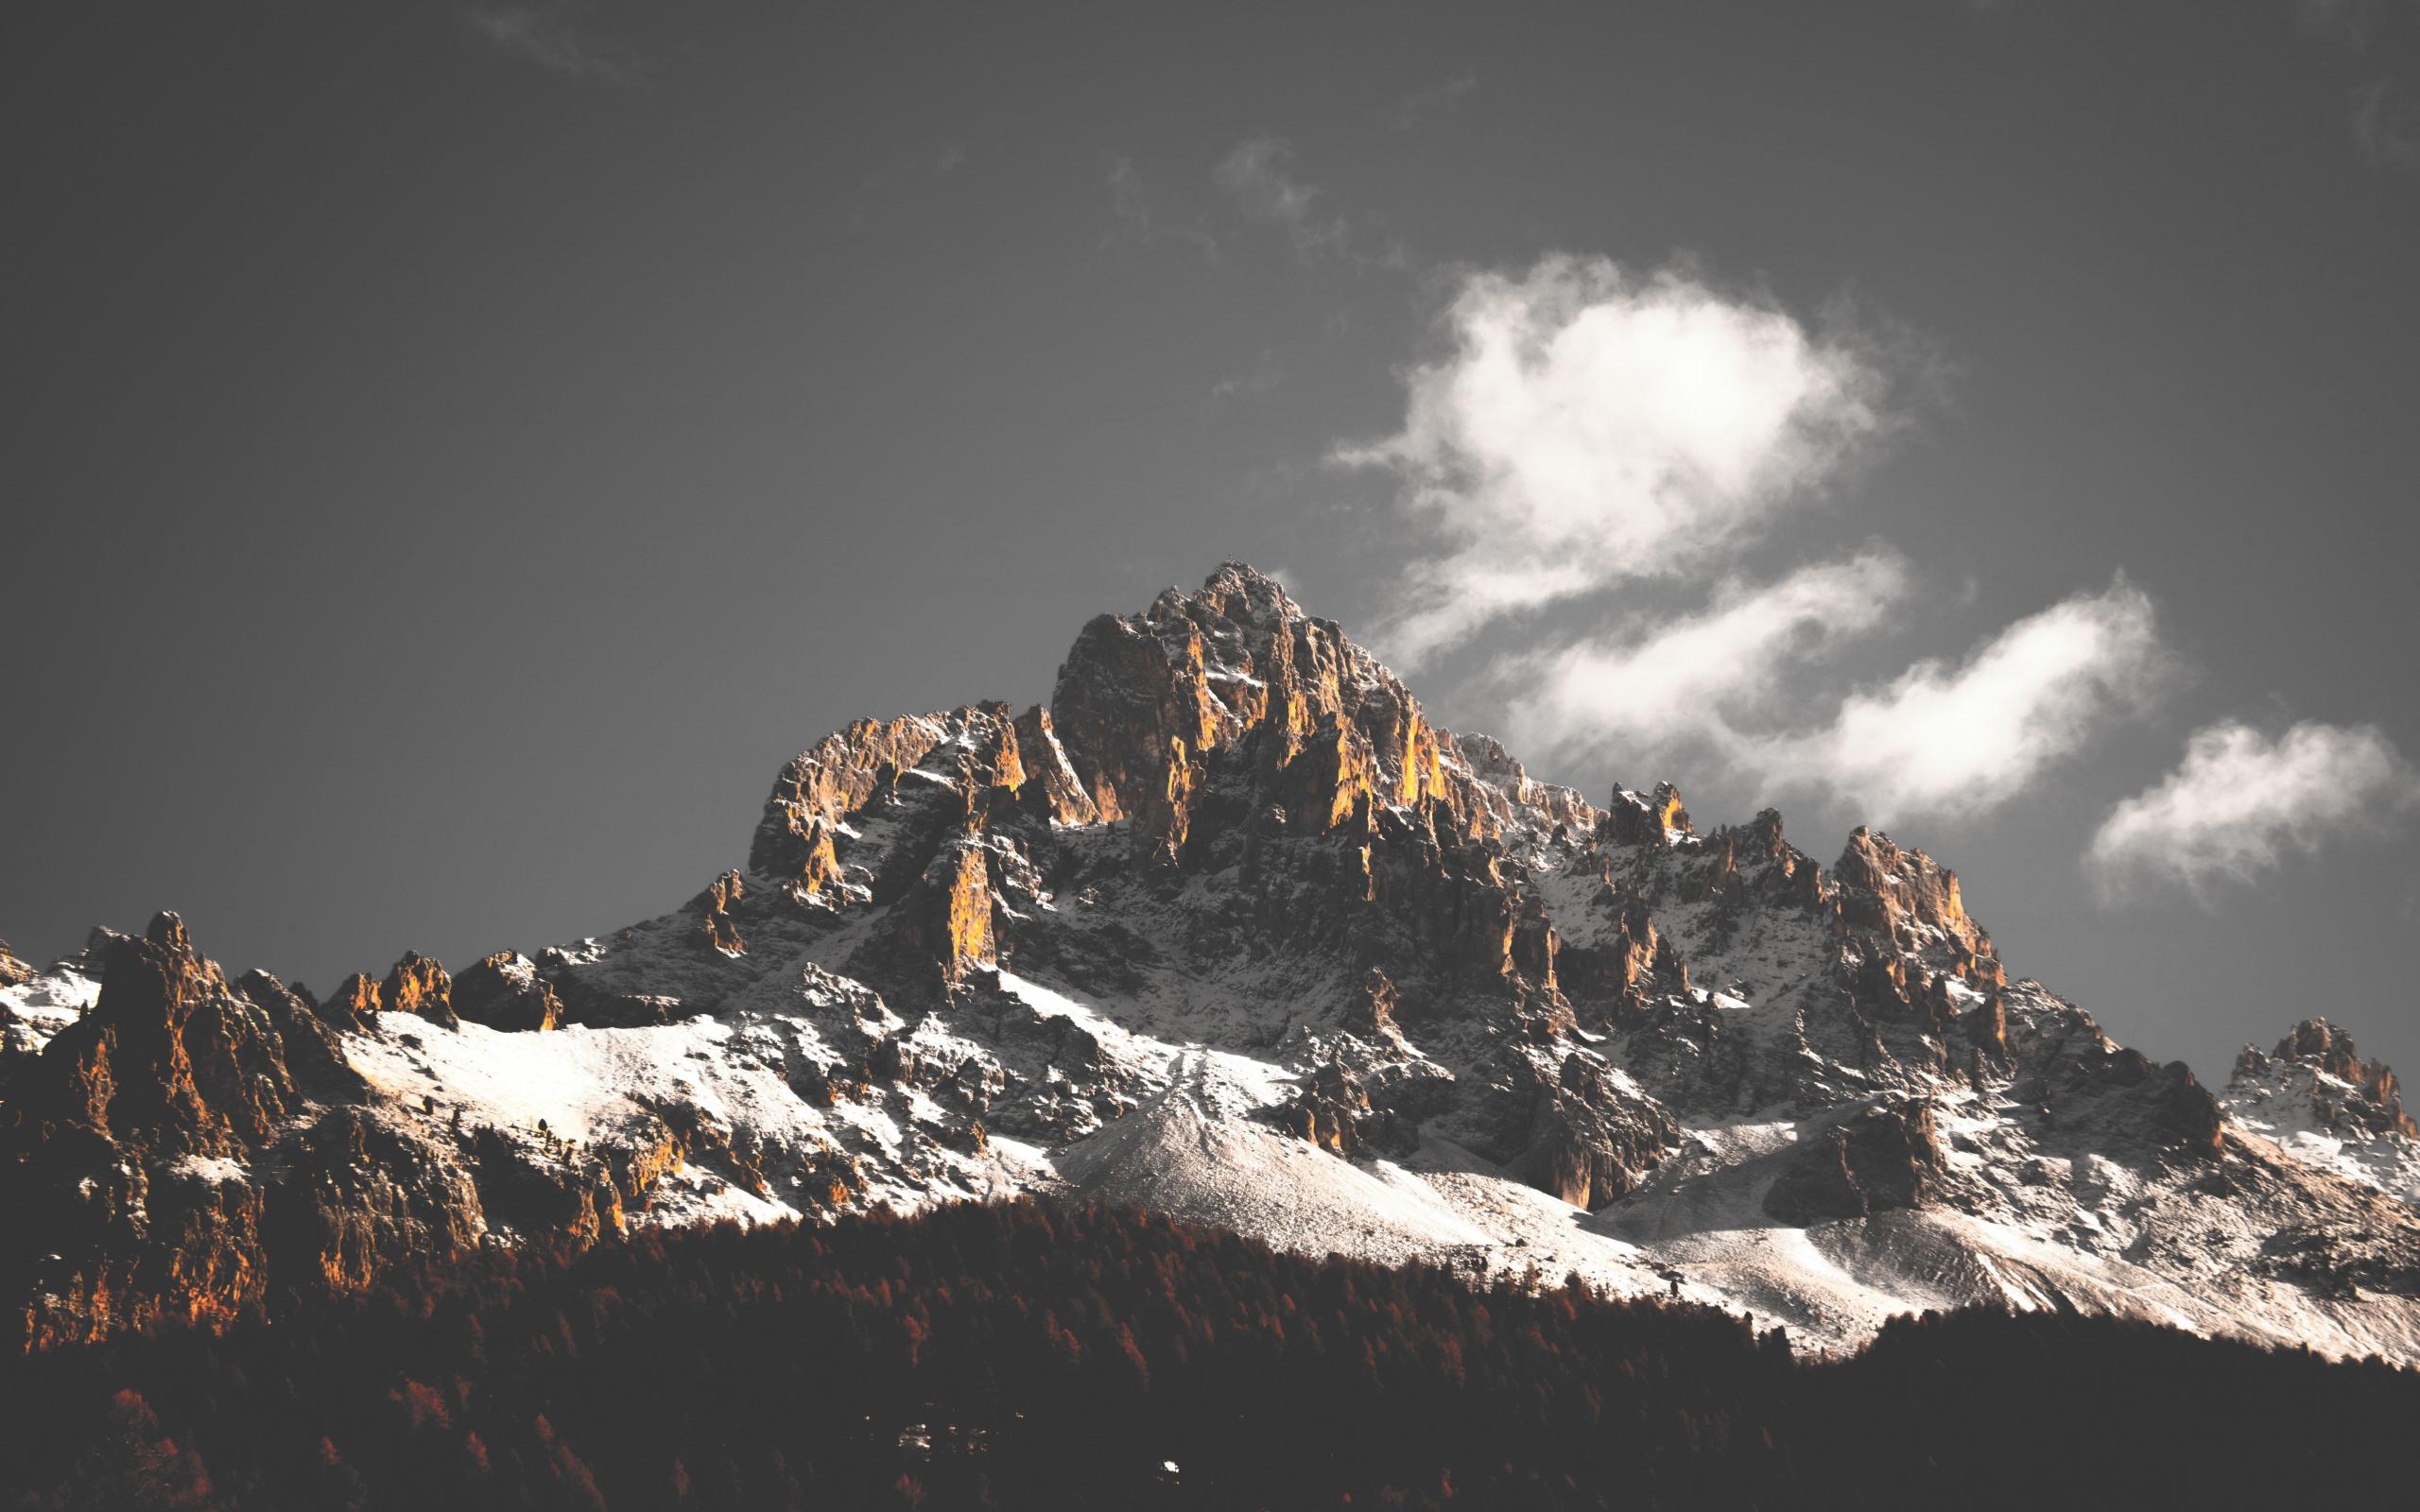 Mountain cliffs, nature, sky, clouds, tree, 2560x1600 wallpaper